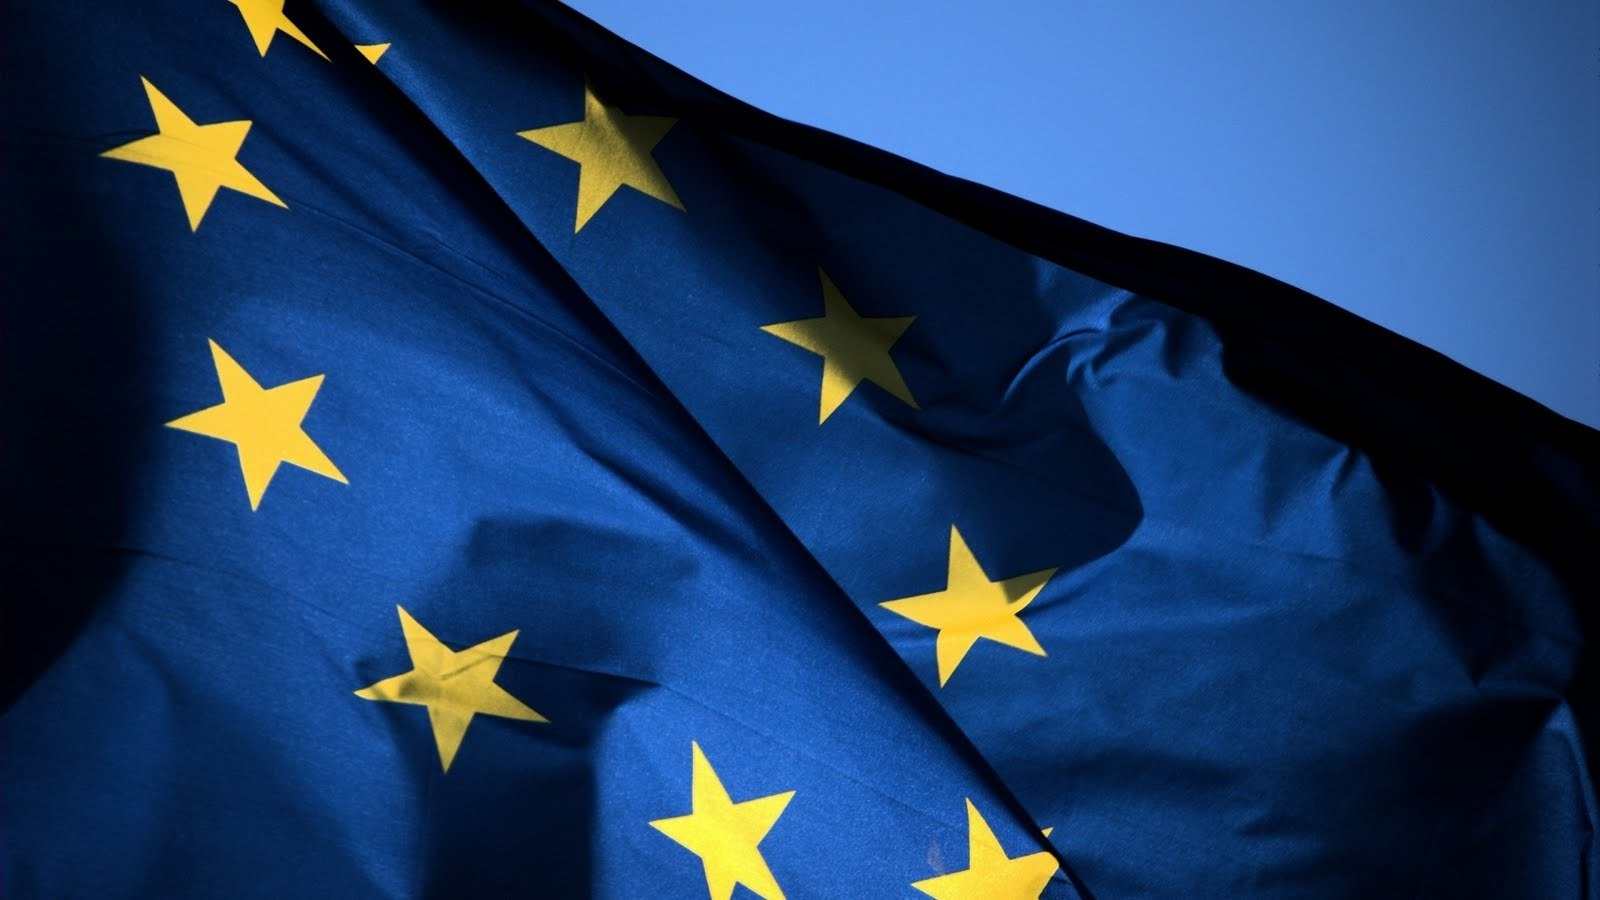 la commission europ u00e9enne recrute